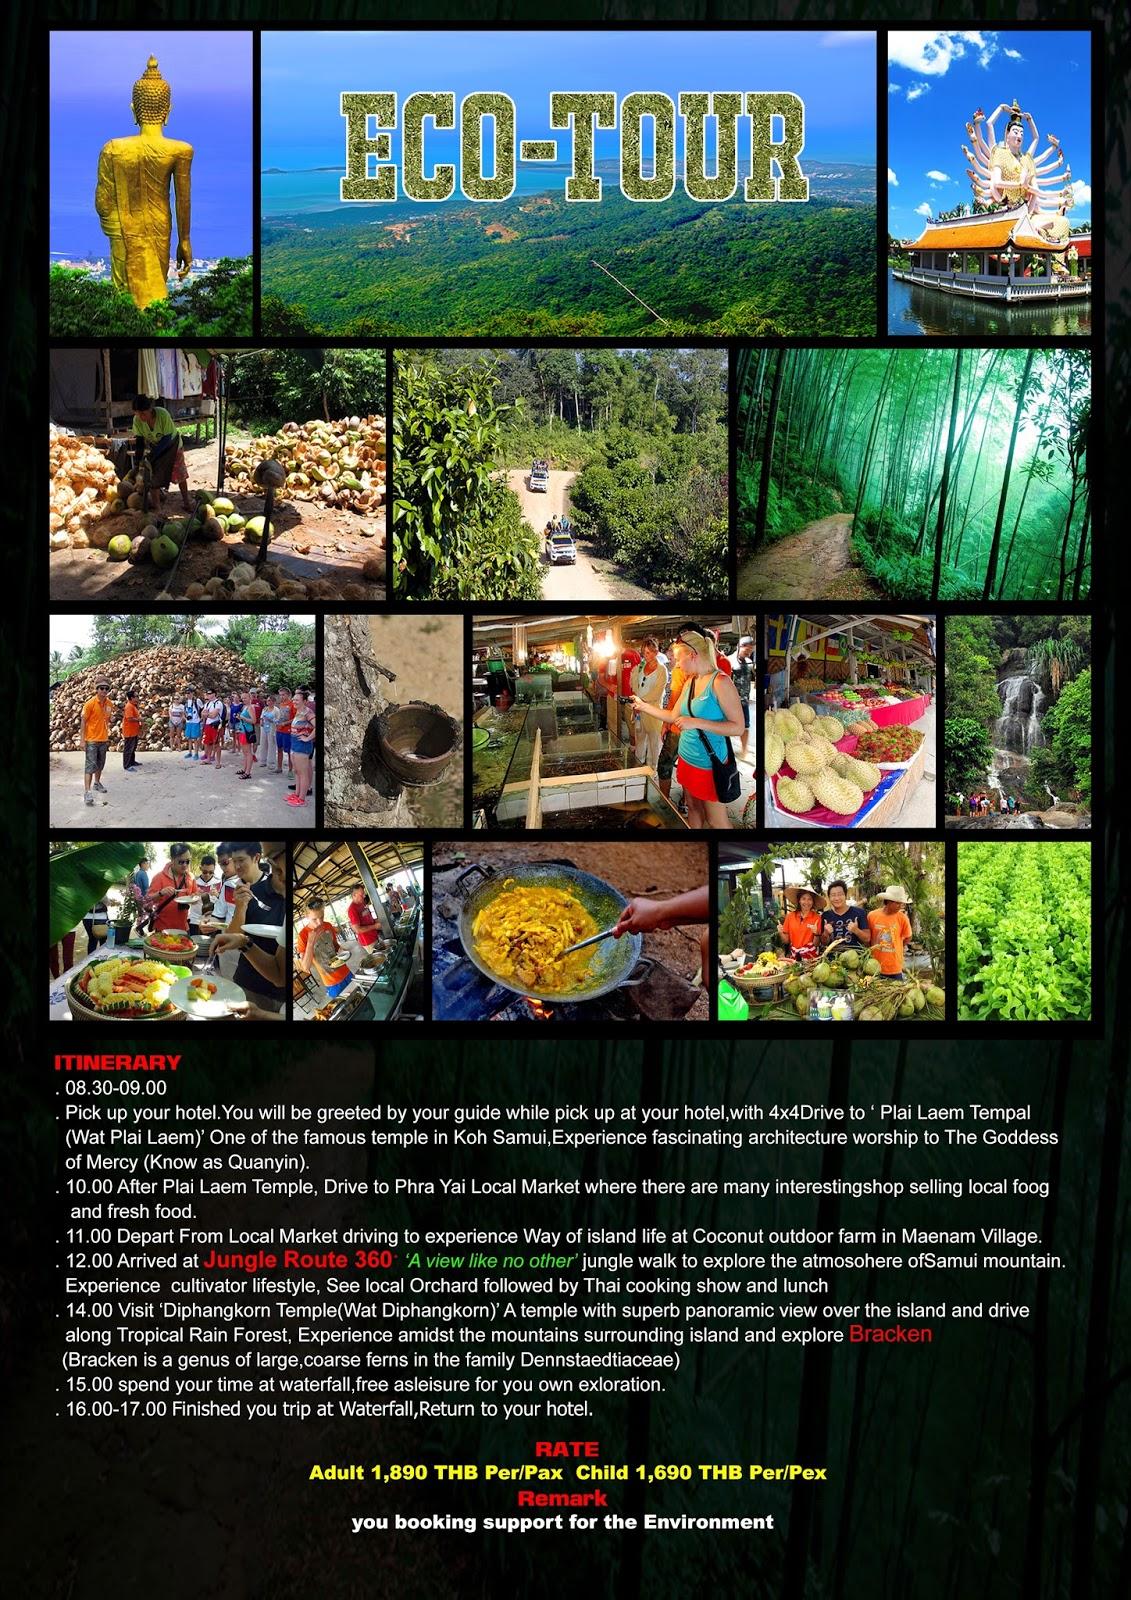 Vision Grand Safari Tour Koh Samui